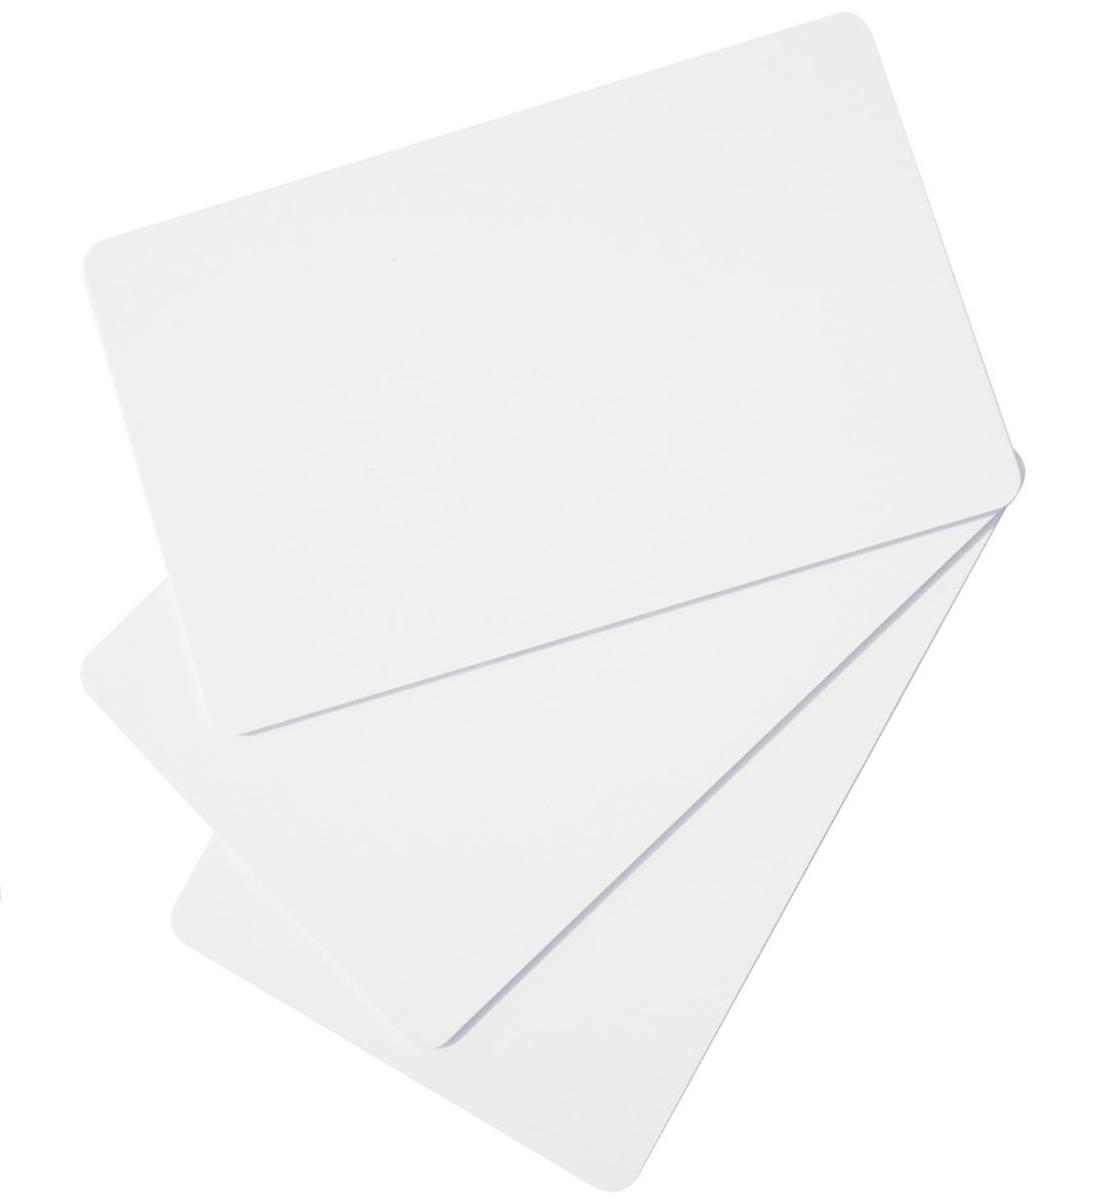 HID Fargo Printer Supplies - PVC Card Stock